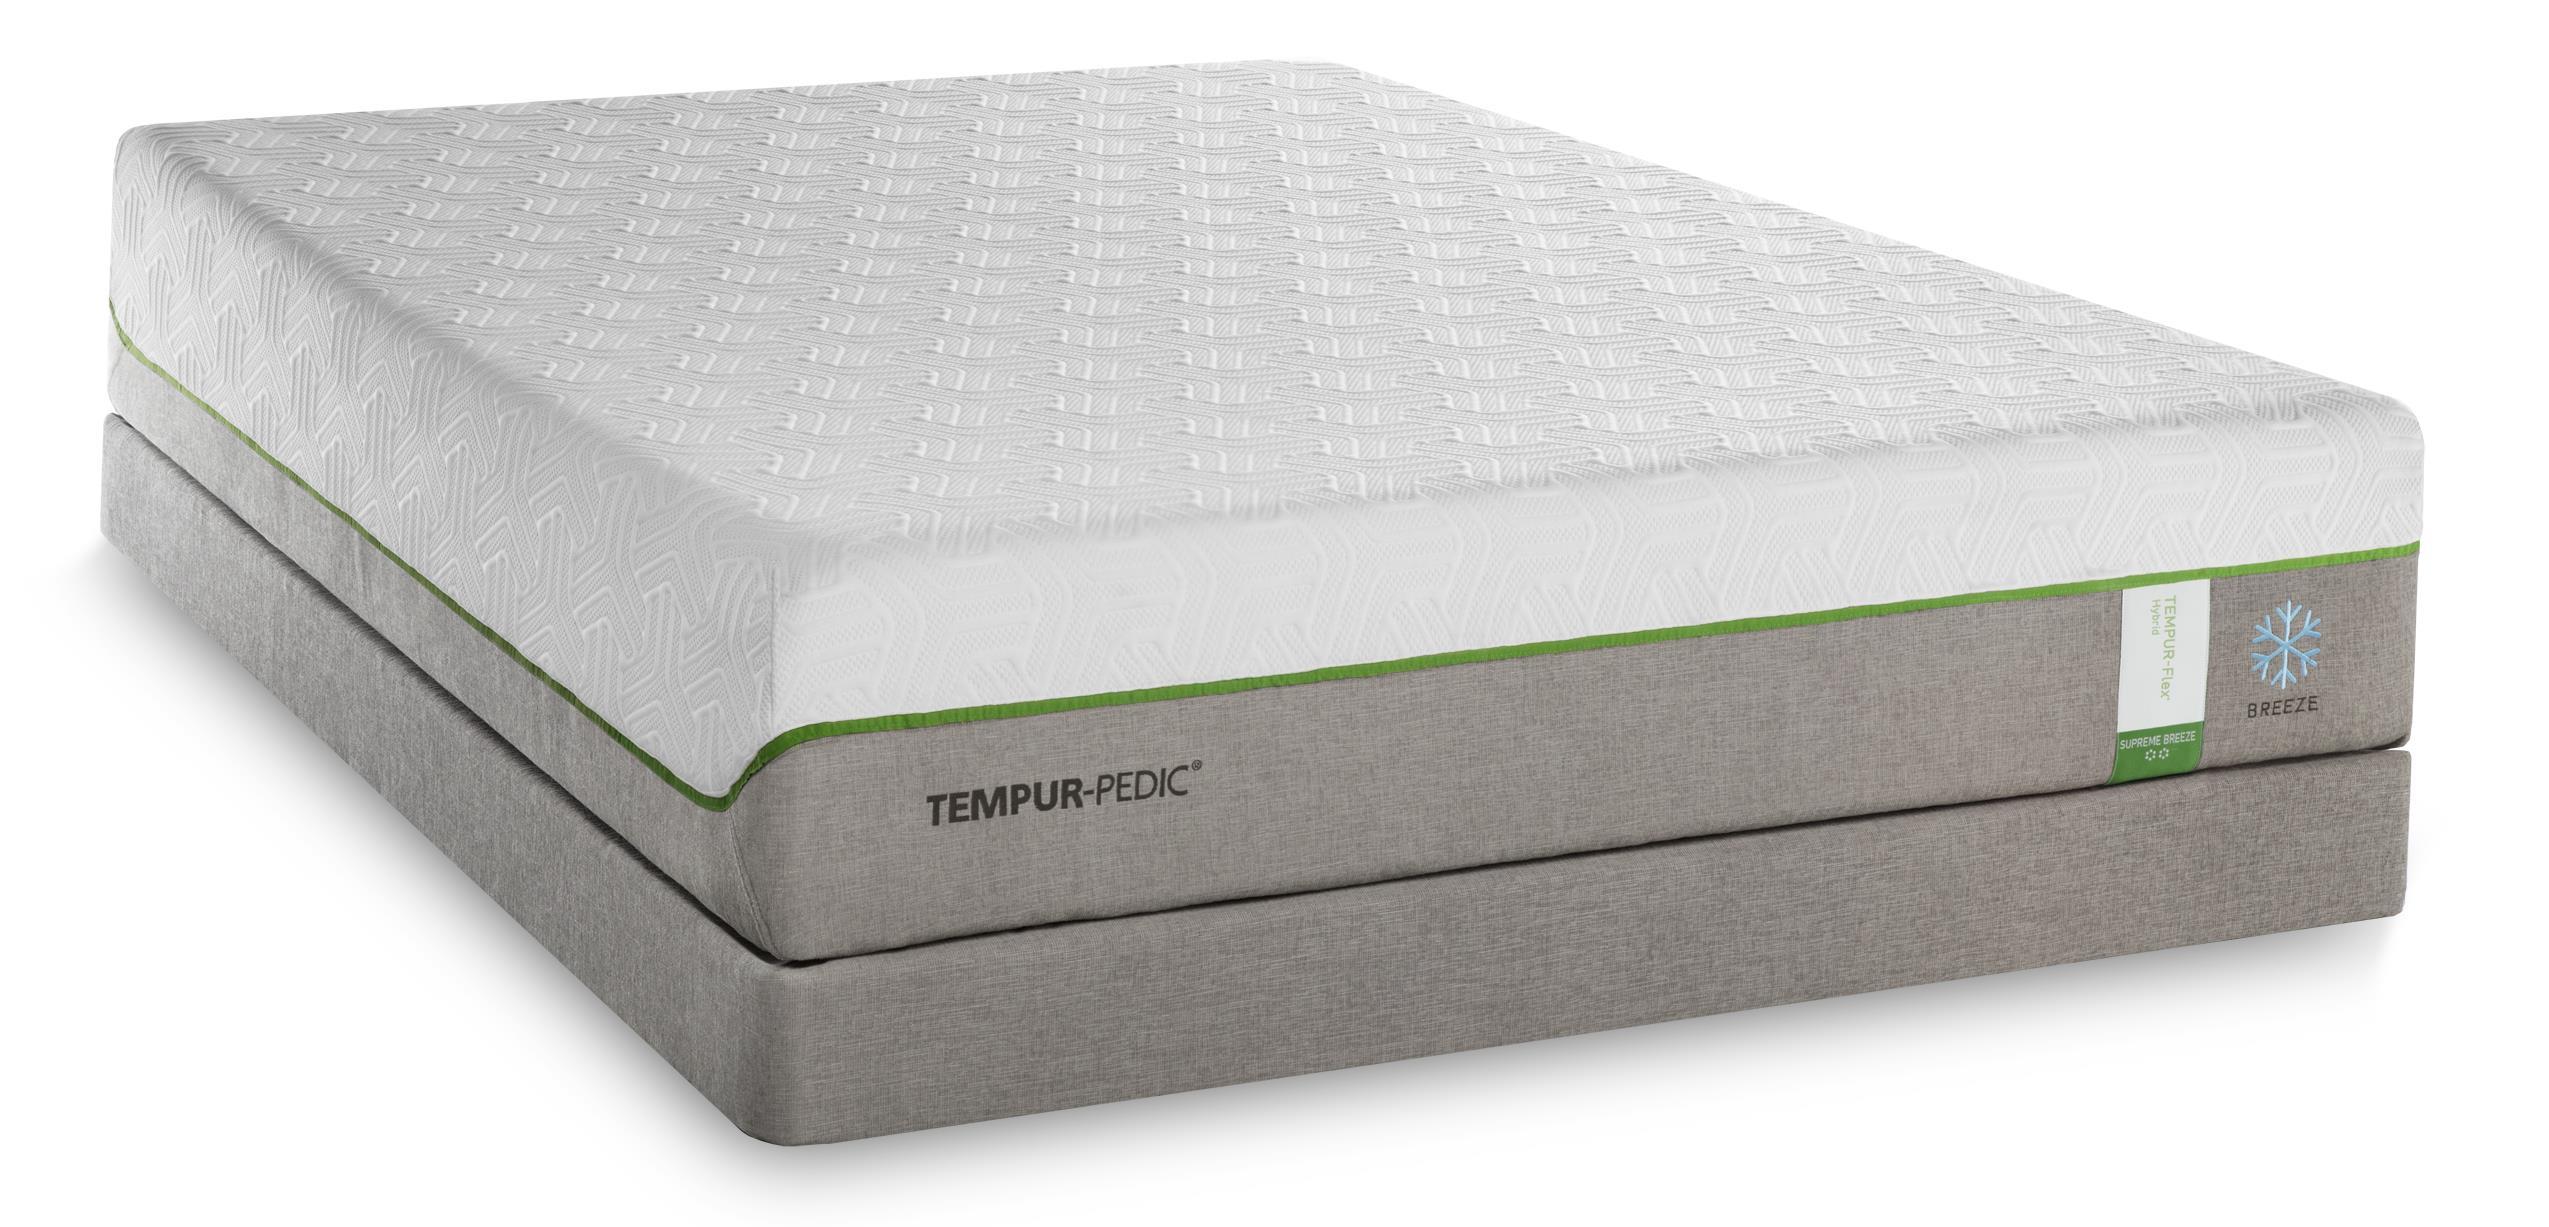 Tempur-Pedic® TEMPUR-Flex Supreme Breeze California King Medium Plush Mattress Set - Item Number: 10292290+2x20510190